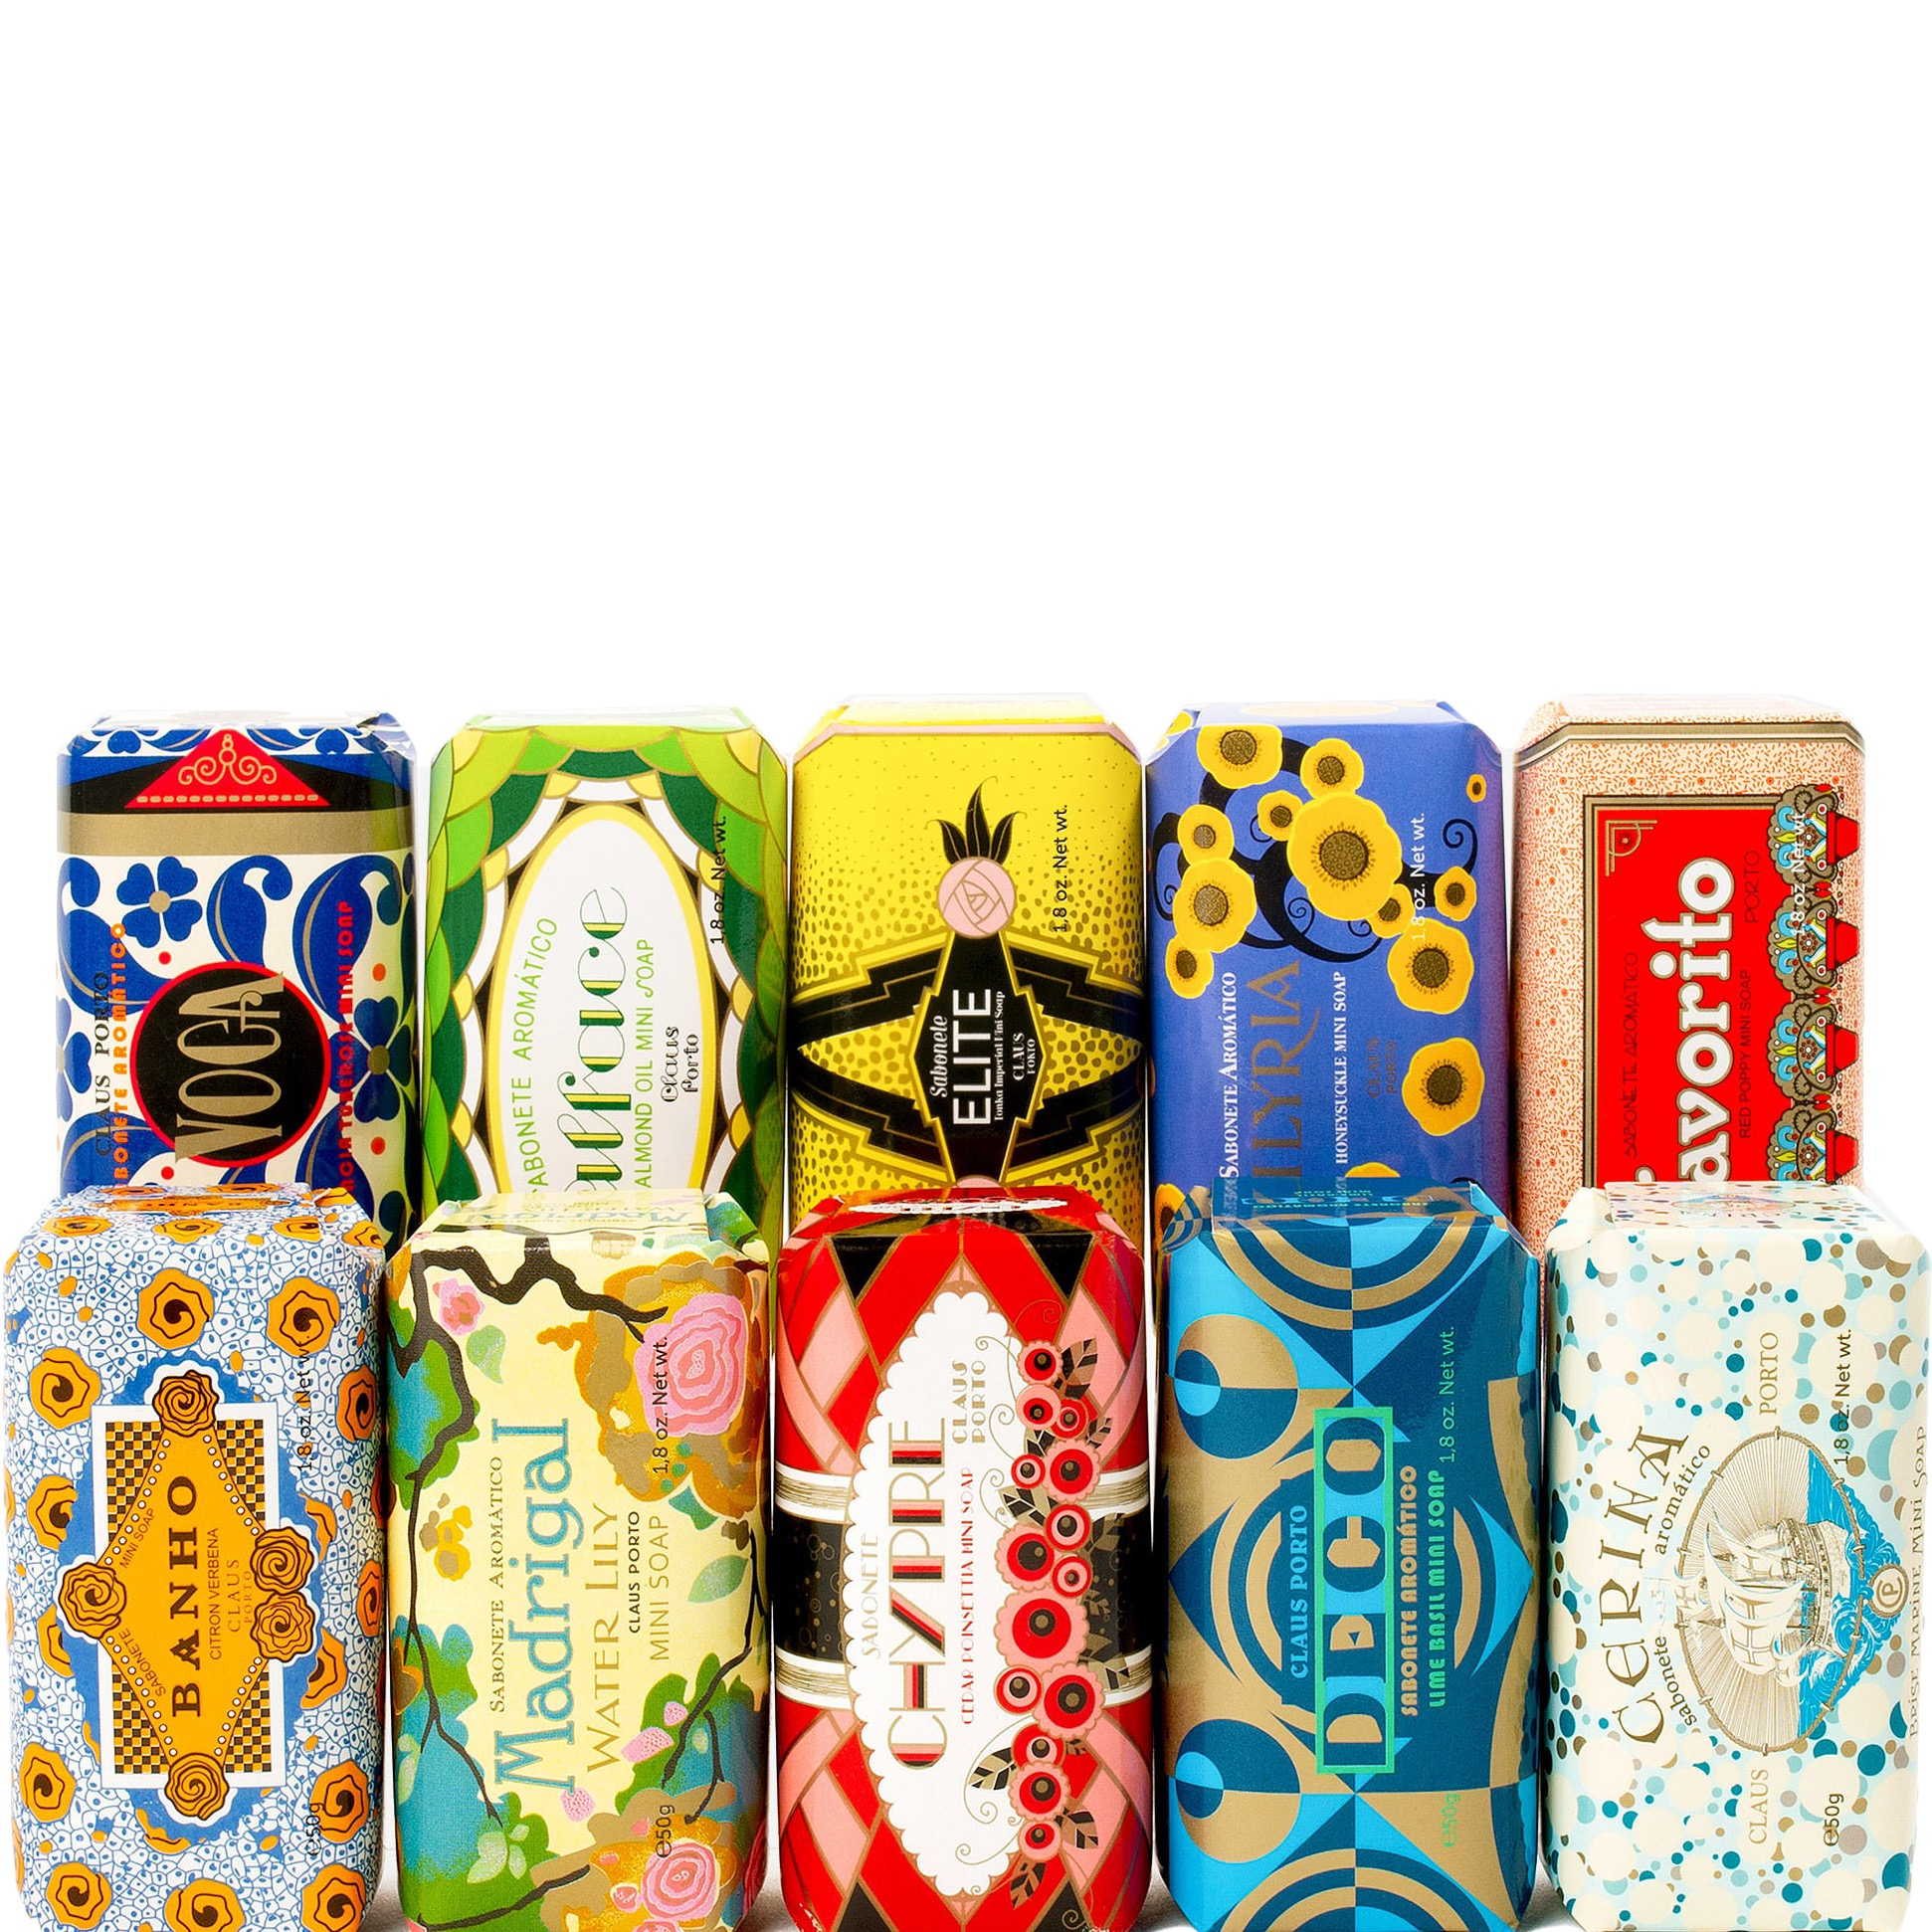 Soap Bar Alface / Almond Oil